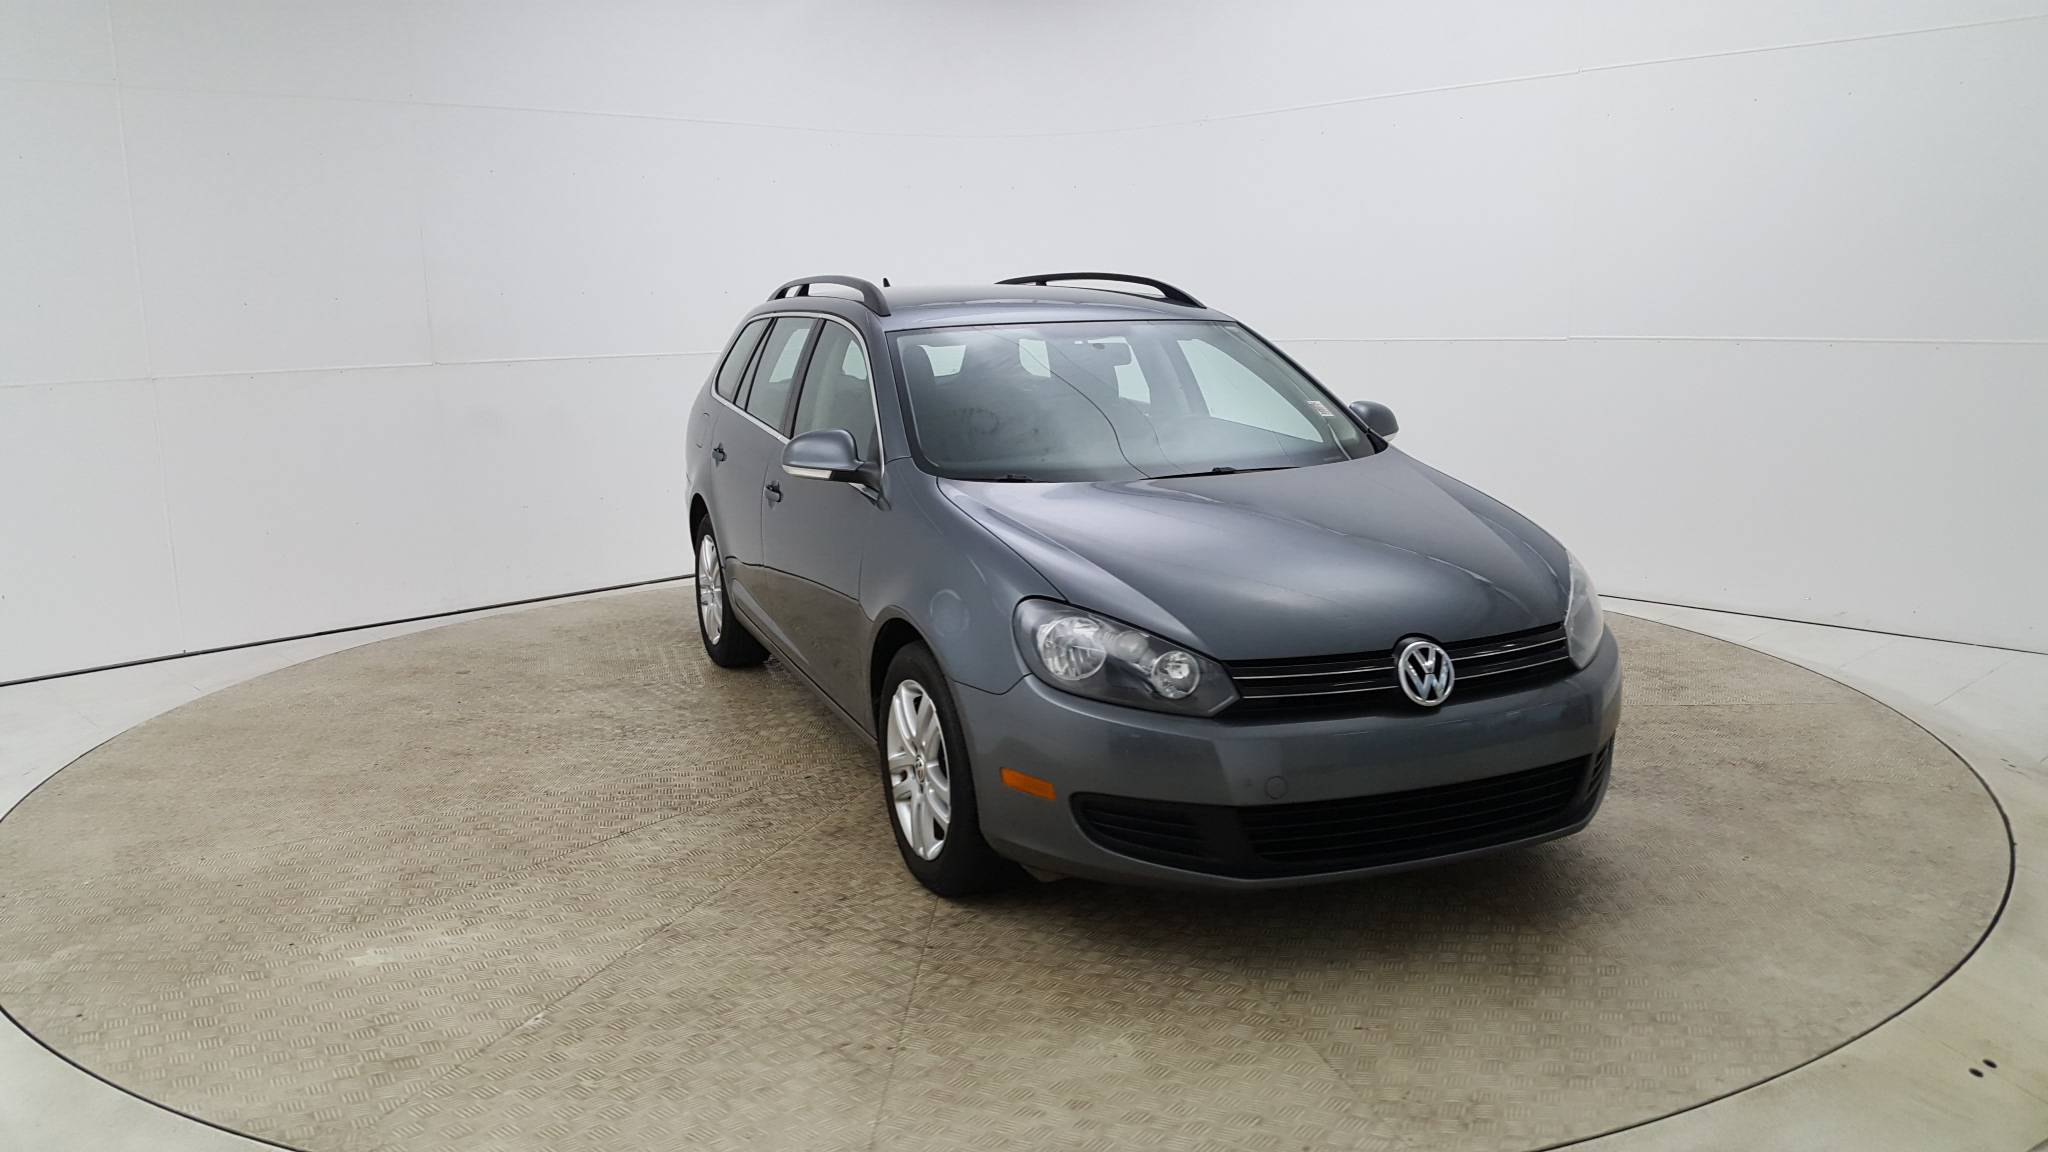 Pre-Owned 2012 Volkswagen Jetta TDI